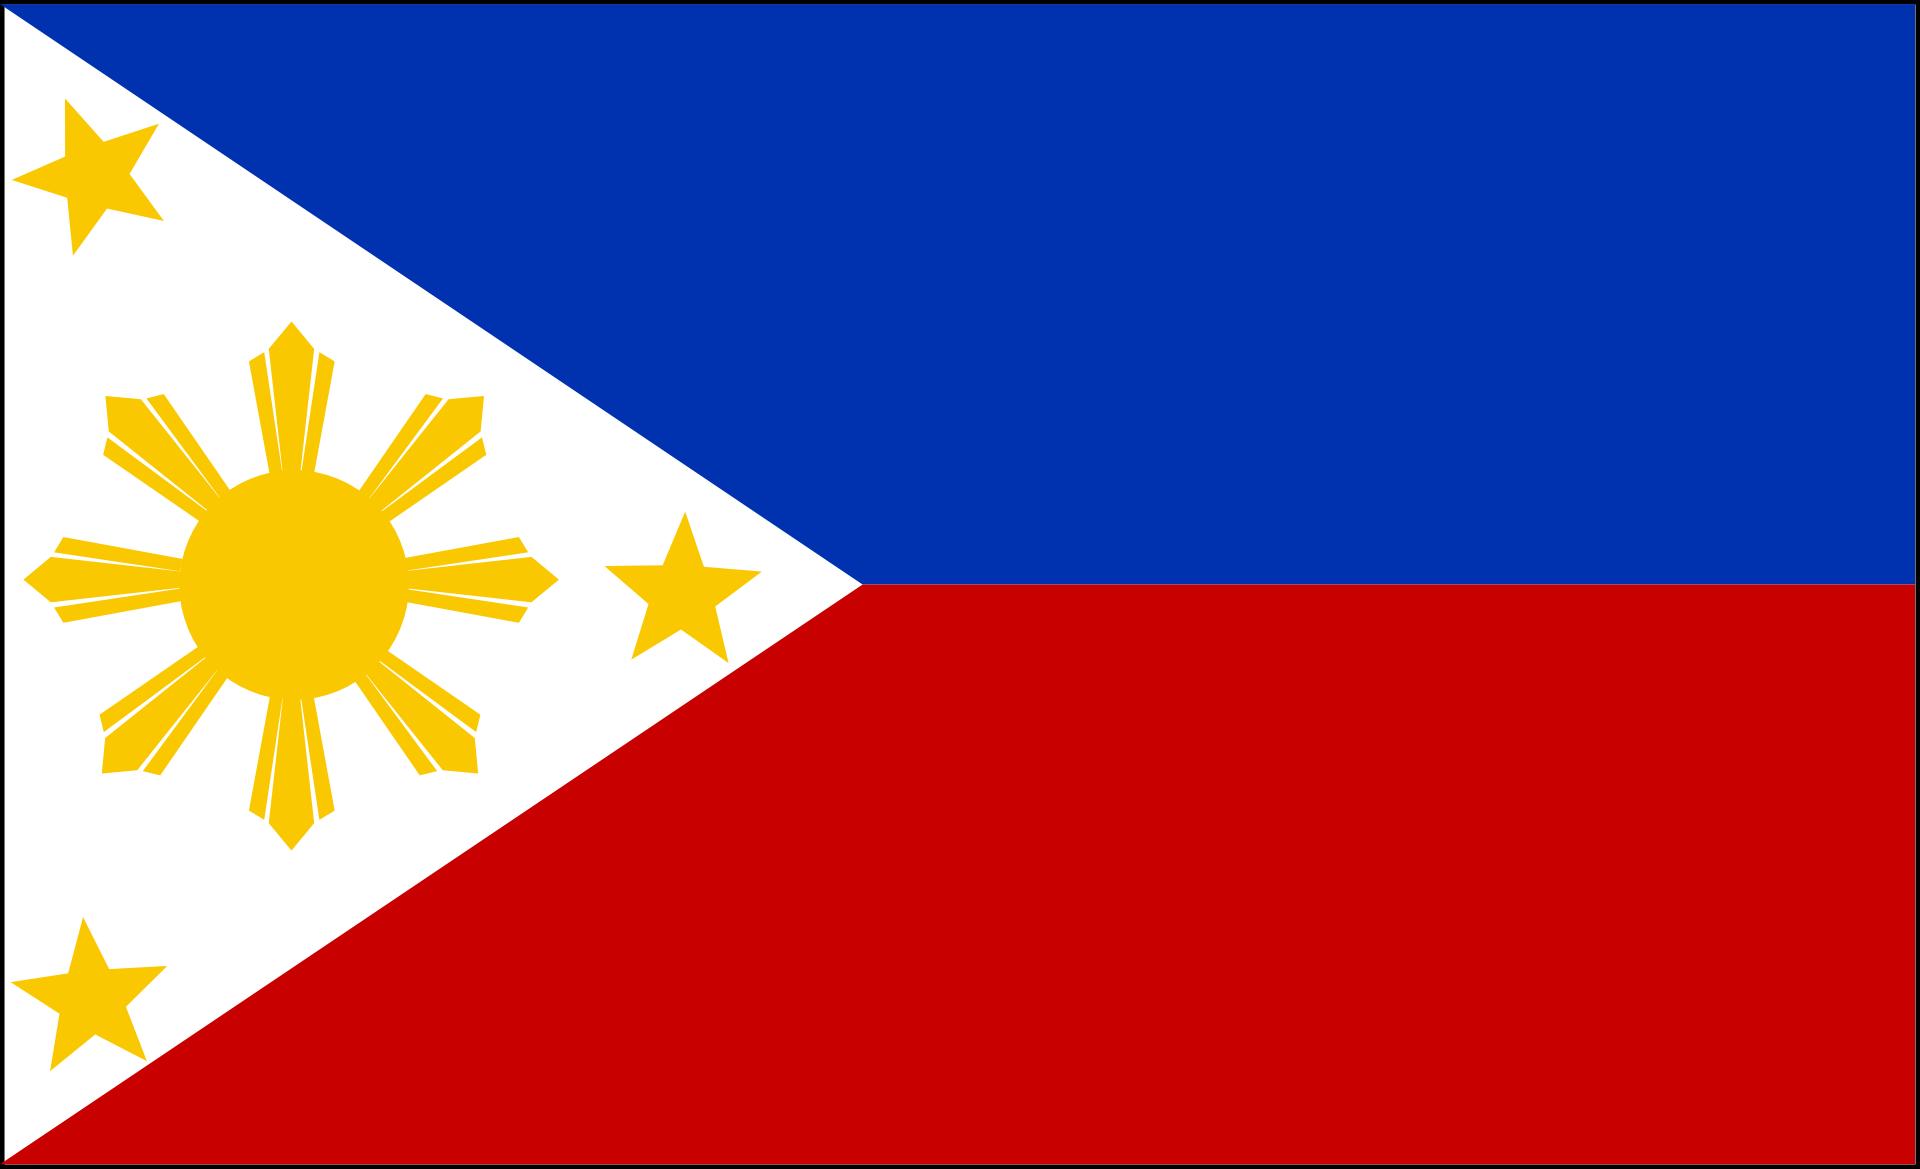 Pin Auf International Flags Pro